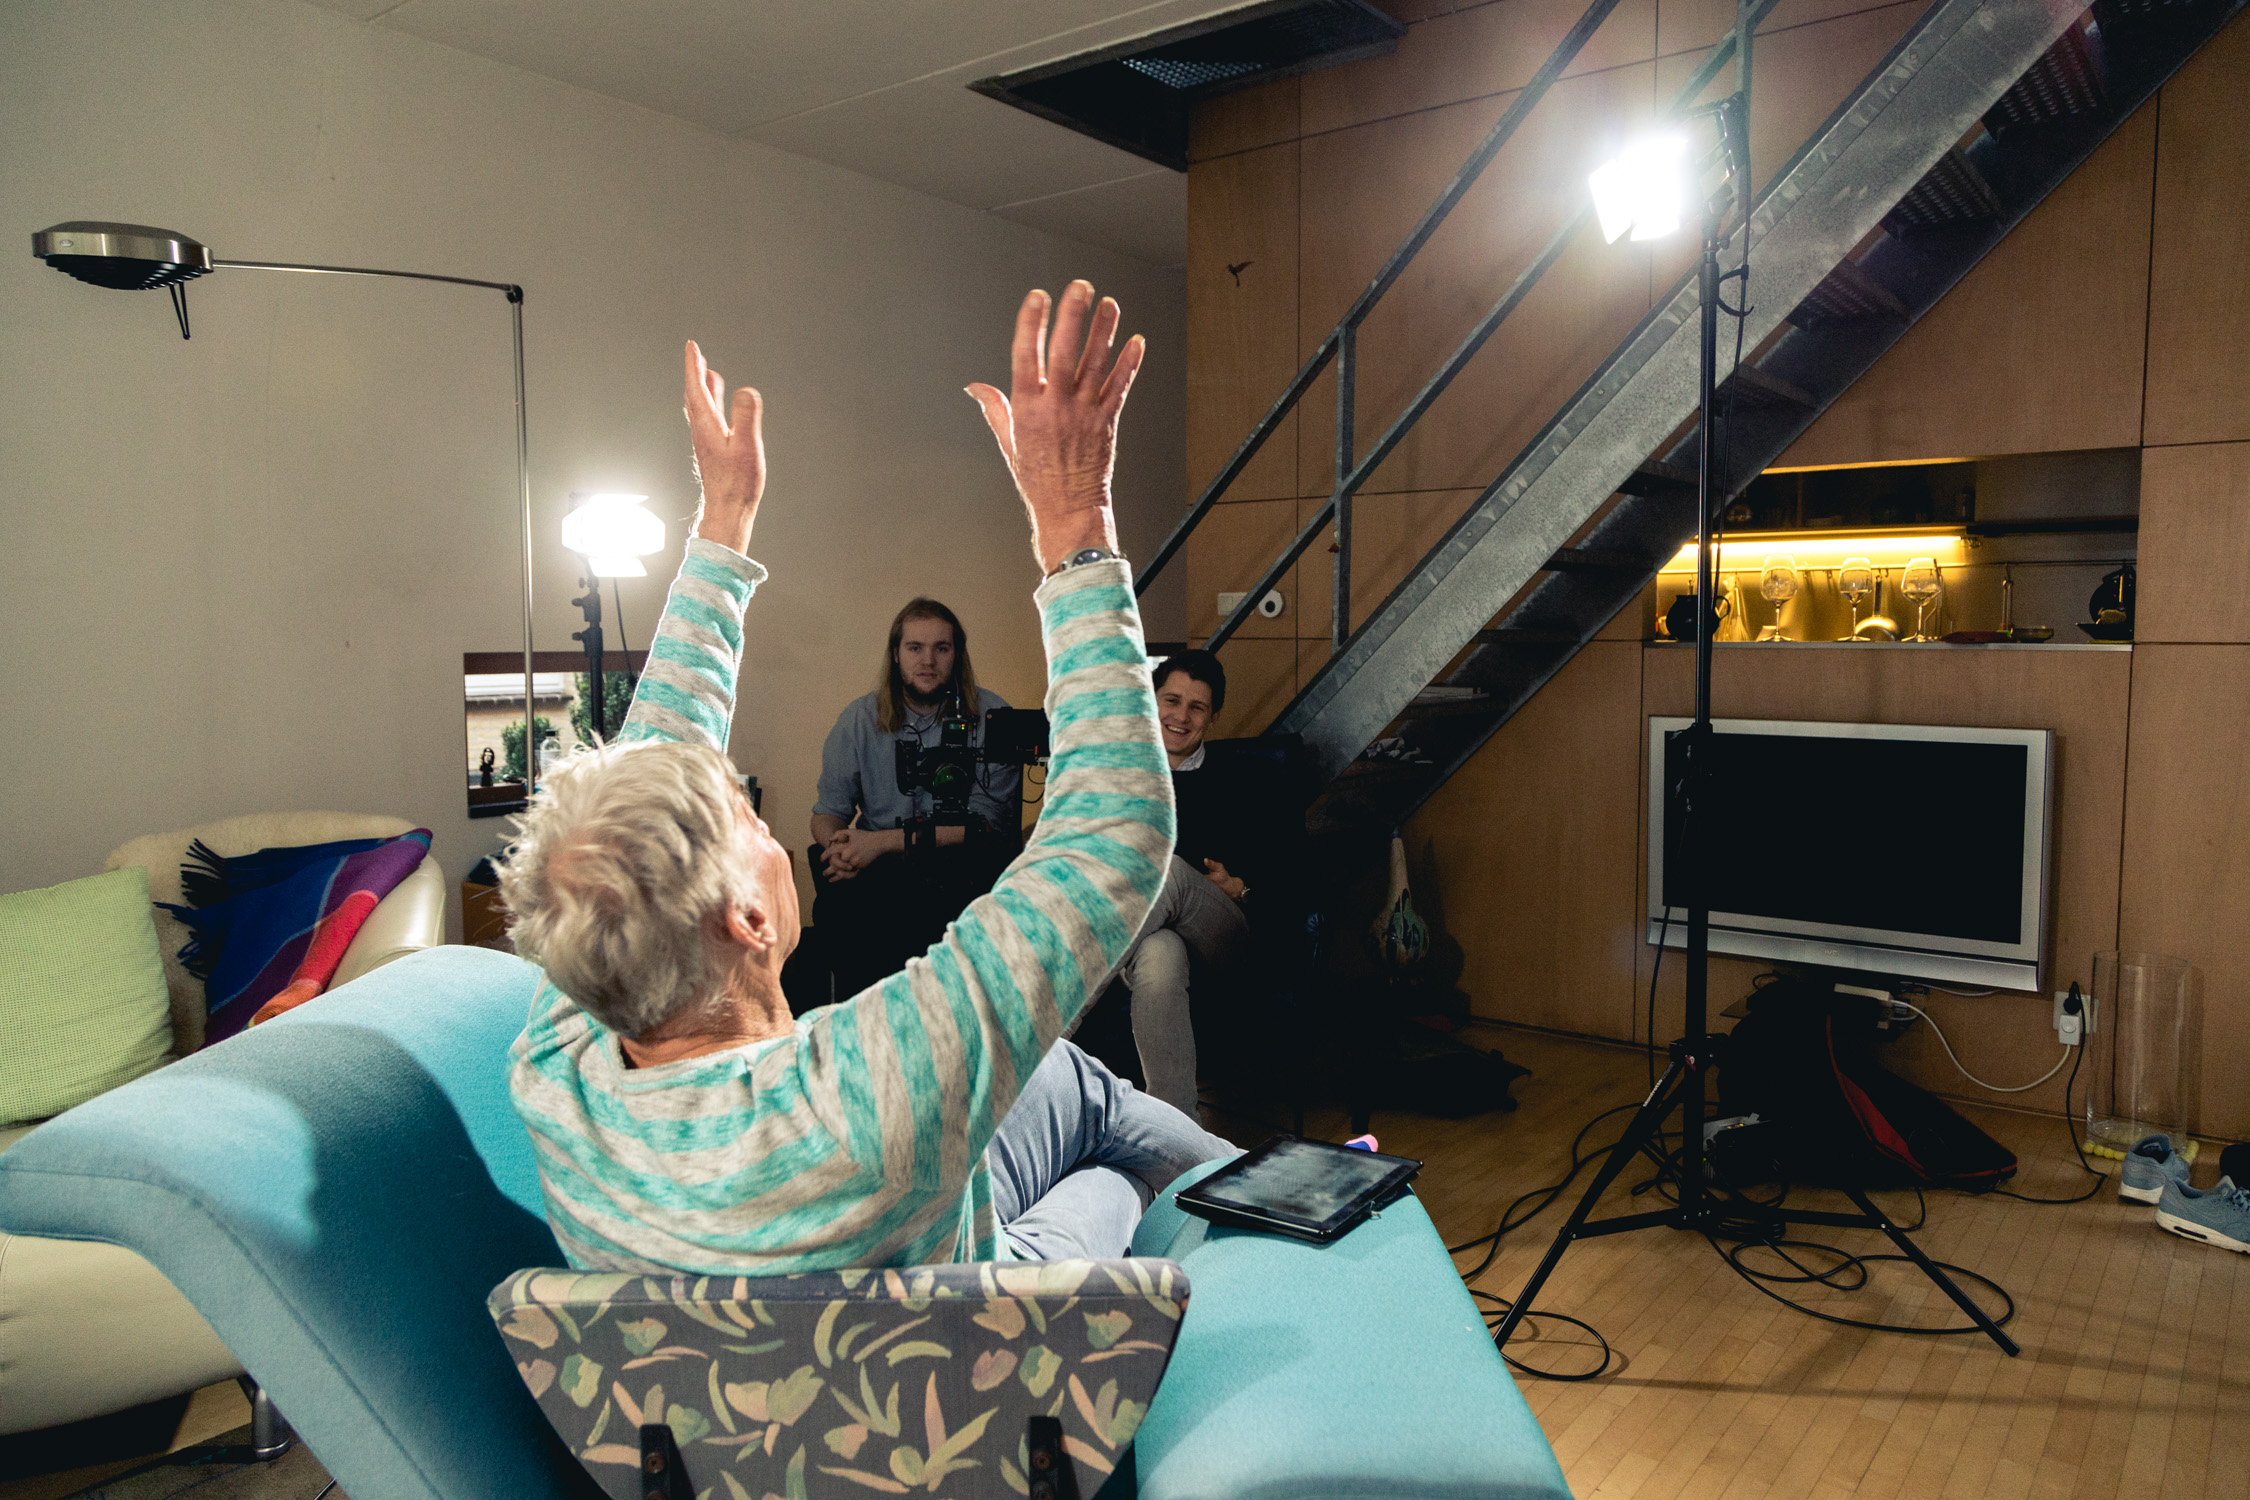 Behind the scenes of Deloitte TMT shoot